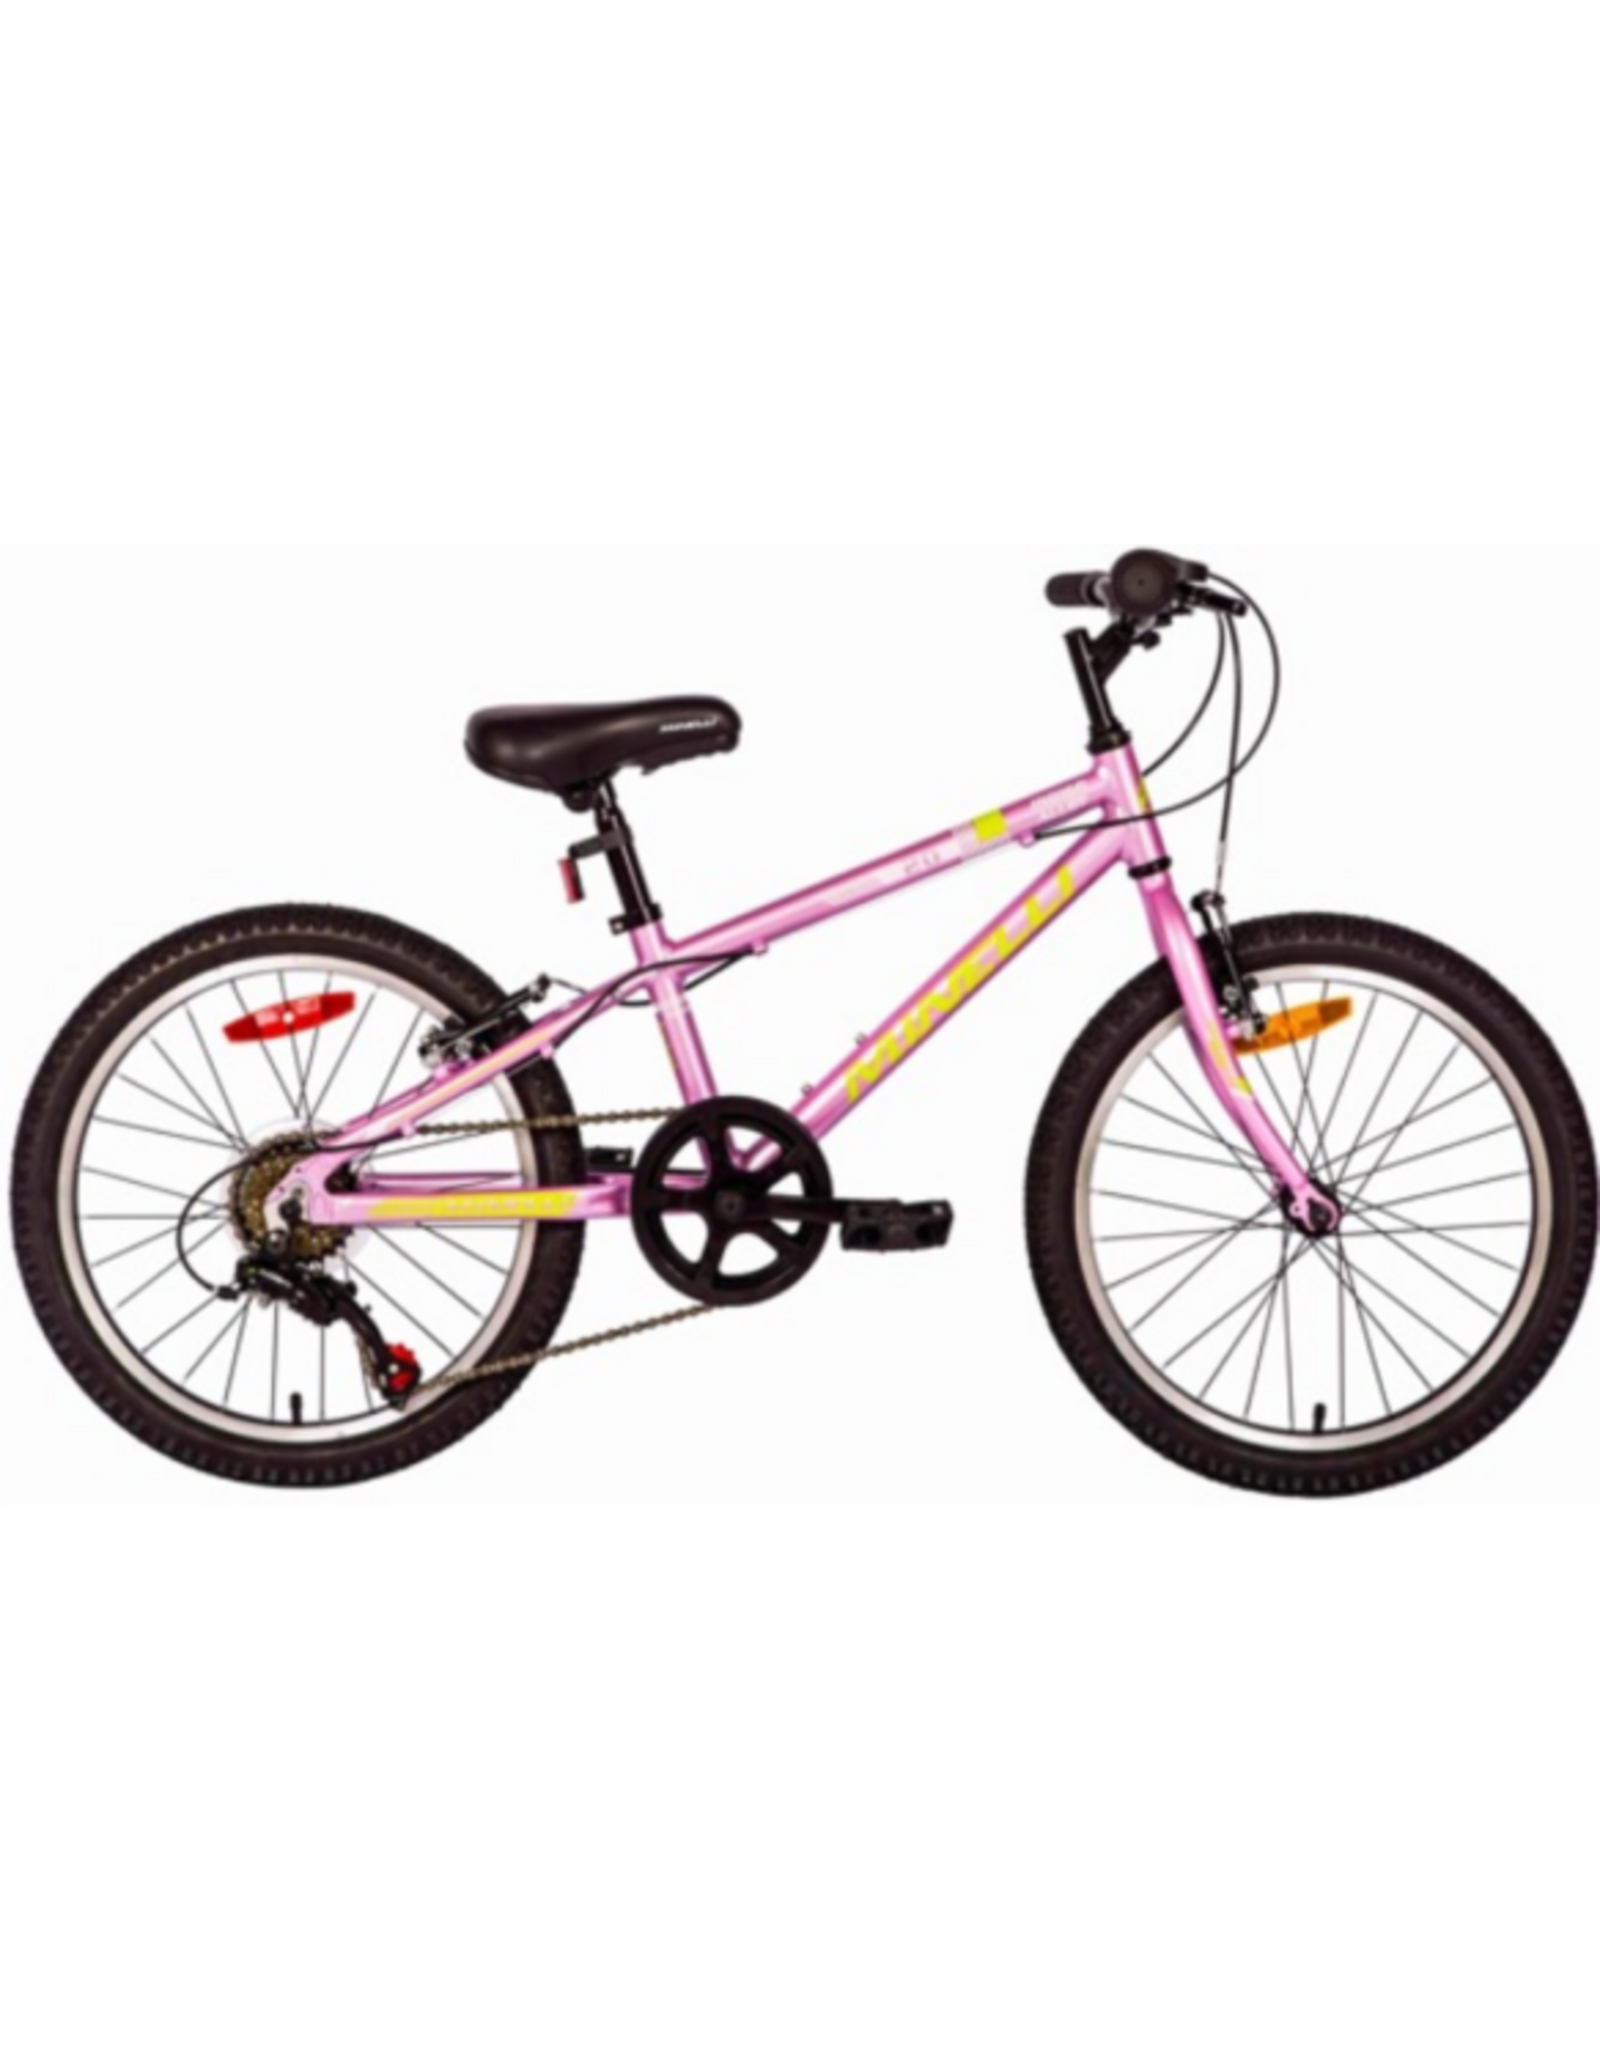 MINELLI-INDIGO ALLOY 20'' junior girl bike